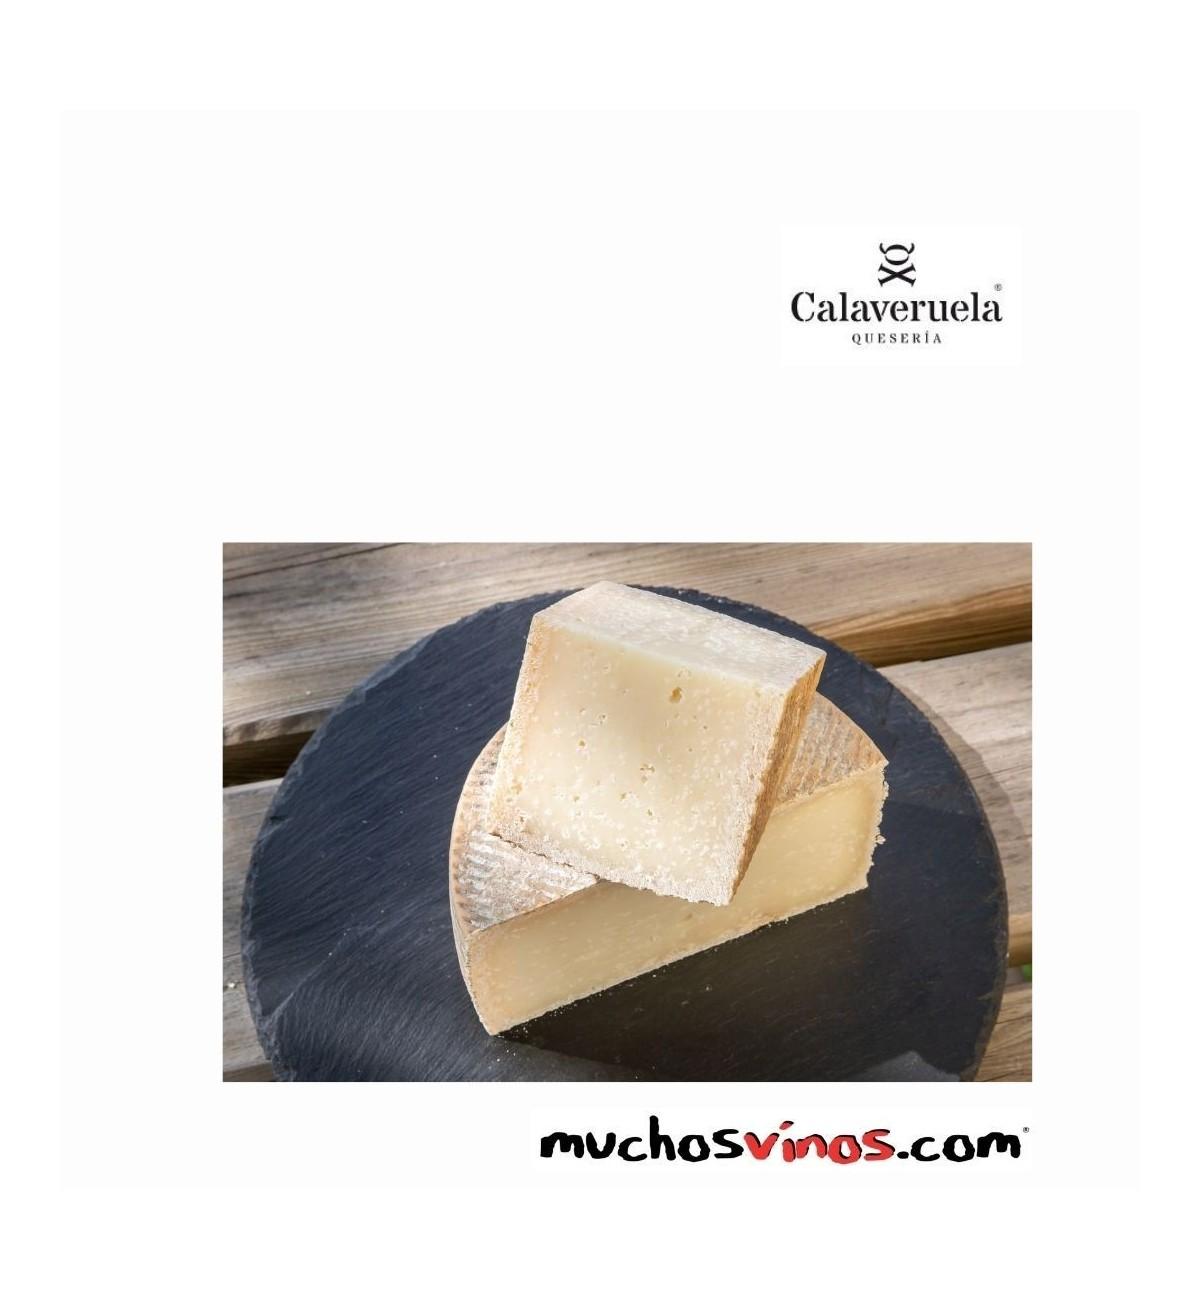 Queso Semicurado de Calaveruela 2 kg Aprox.